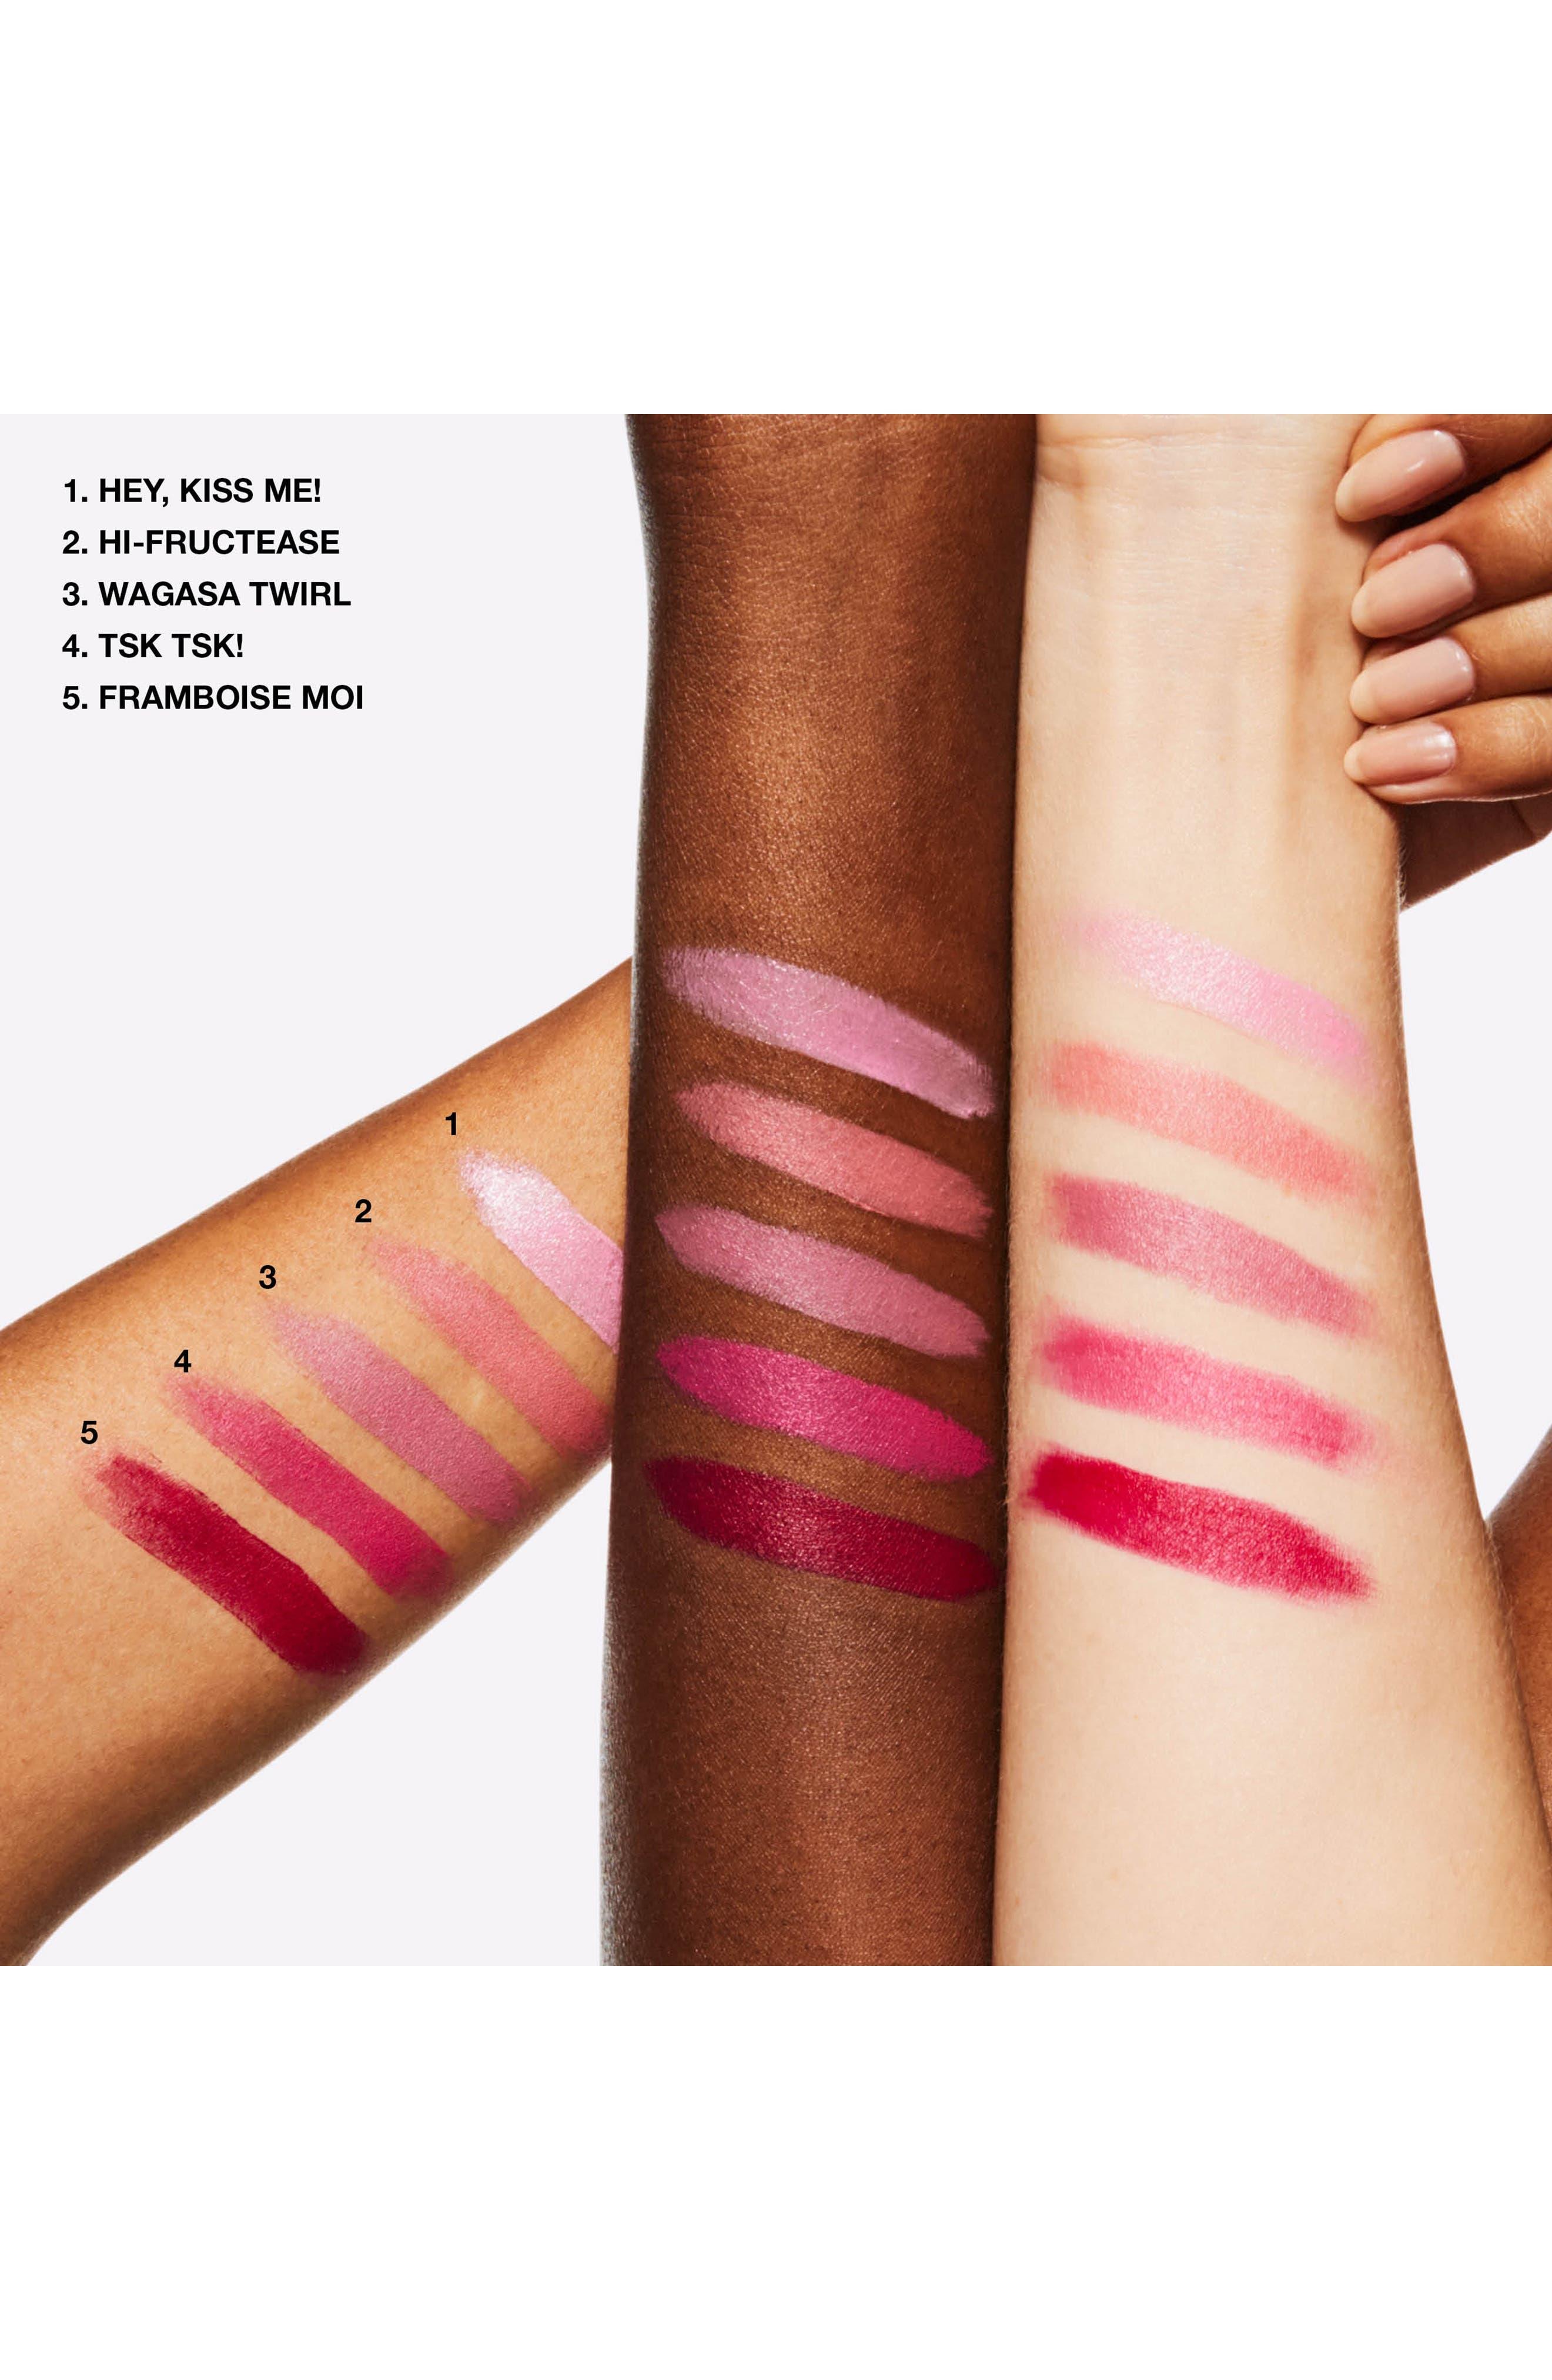 MAC COSMETICS, MAC Boom, Boom, Bloom Lipstick, Alternate thumbnail 3, color, HI-FRUCTEASE (M)